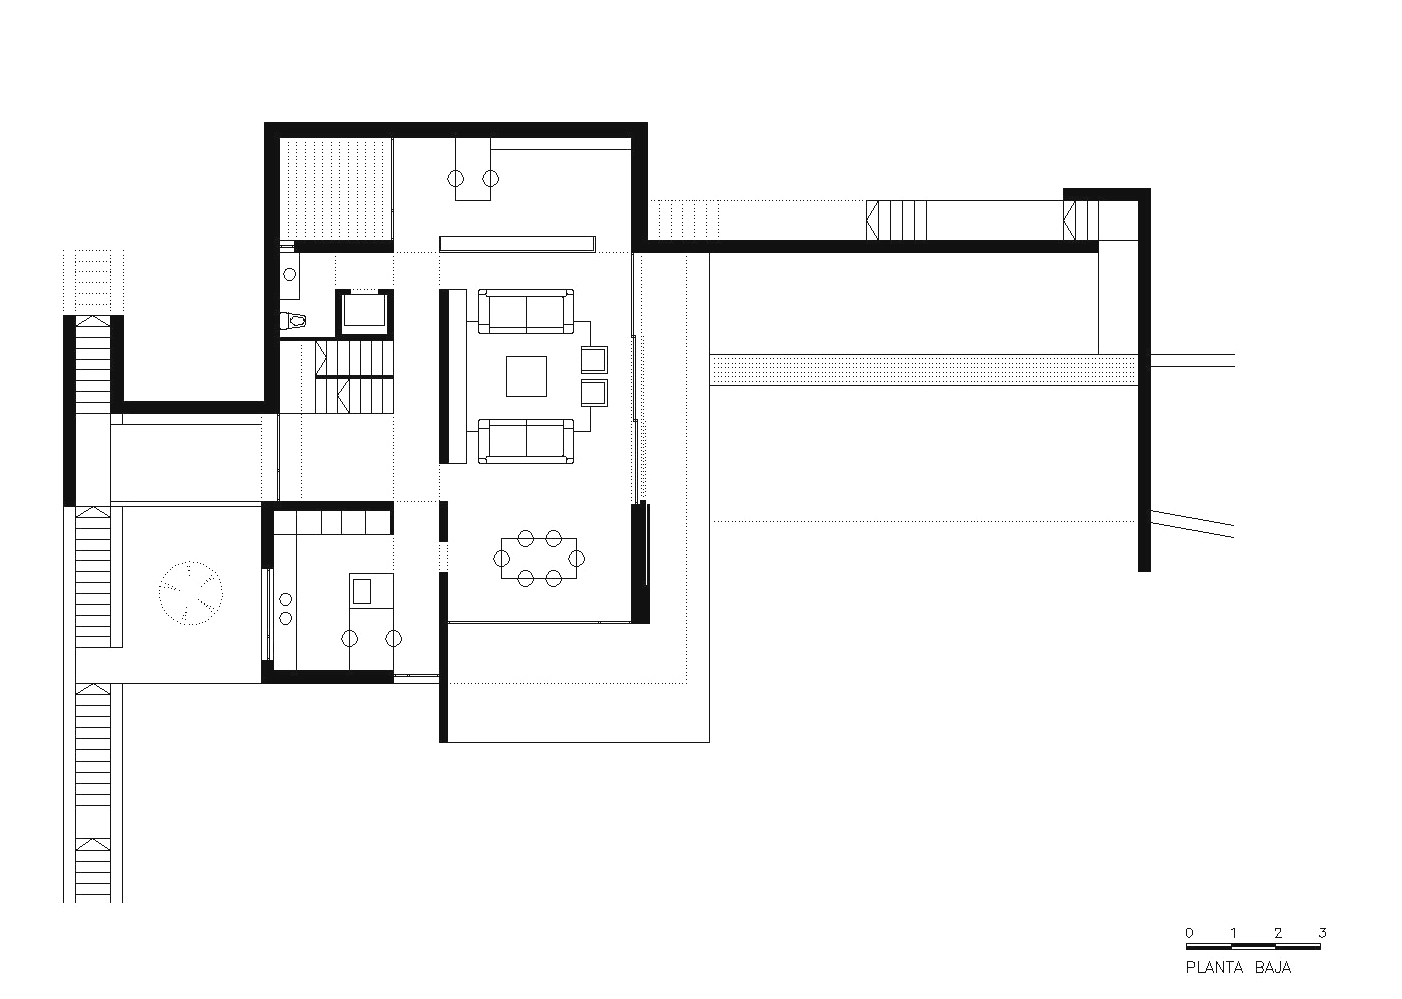 Ariana huerta pati o arquitectura casa a m arq elena for Arquitectura tecnica ua